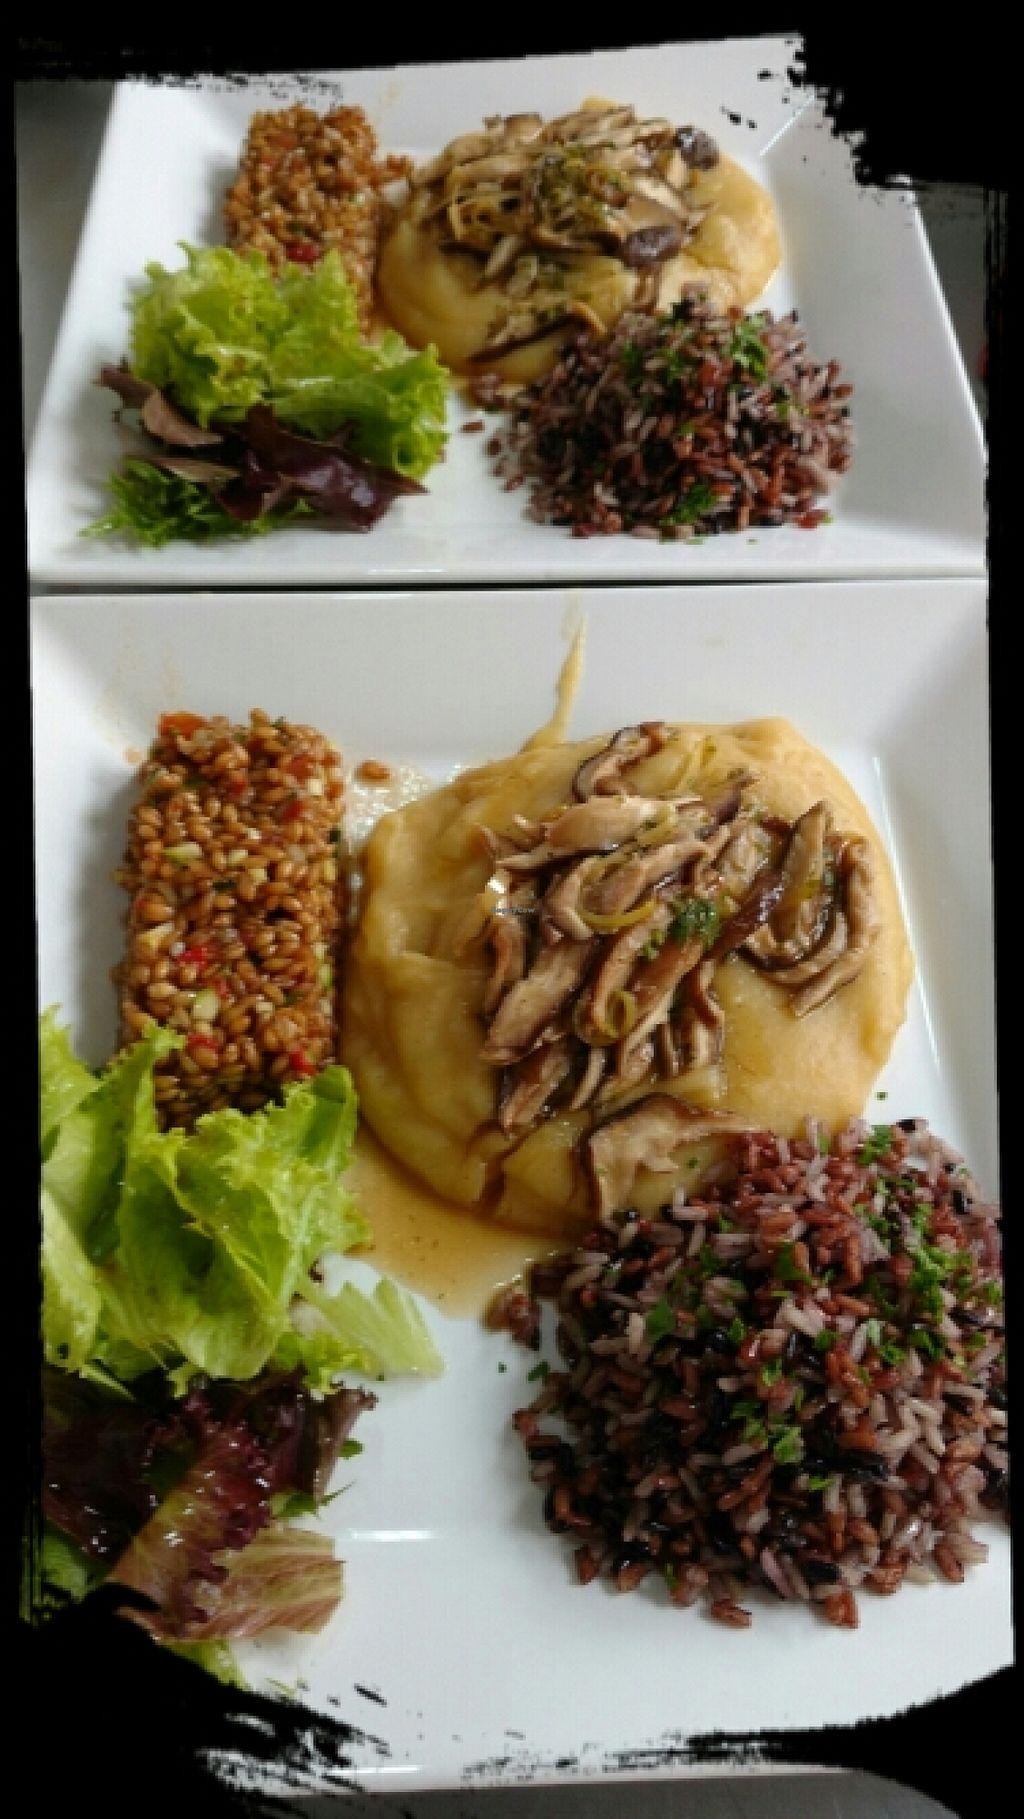 "Photo of EnRaizAr Gastronomia  by <a href=""/members/profile/Adriana%20Reboucas"">Adriana Reboucas</a> <br/>Vegan ! <br/> February 1, 2016  - <a href='/contact/abuse/image/68816/134603'>Report</a>"